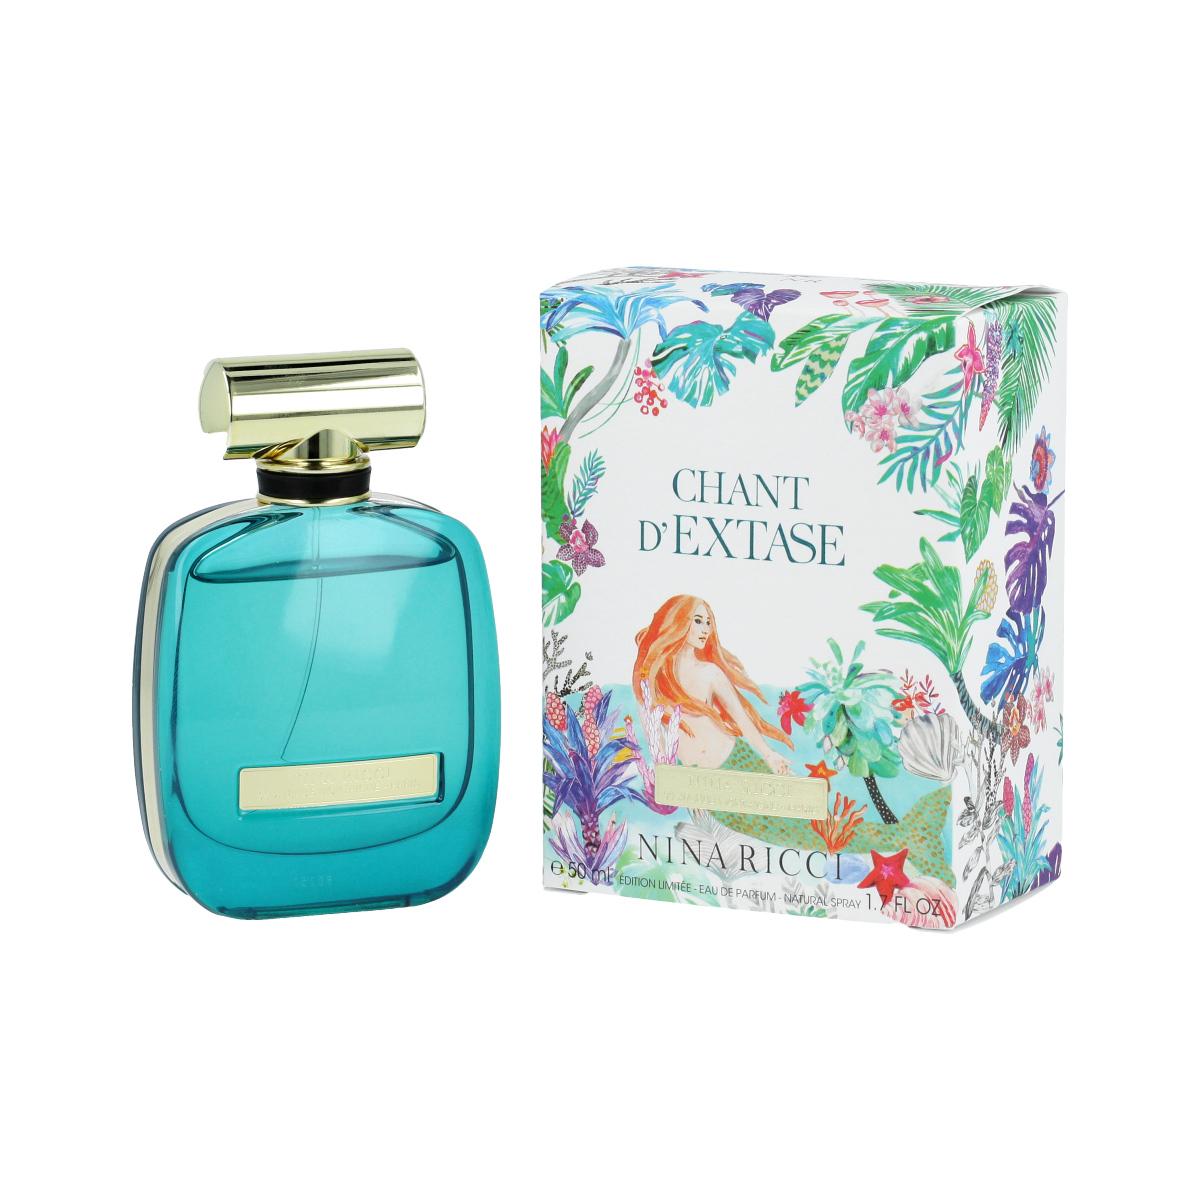 Nina Ricci Chant d'Extase Eau De Parfum 50 ml (woman) 16649